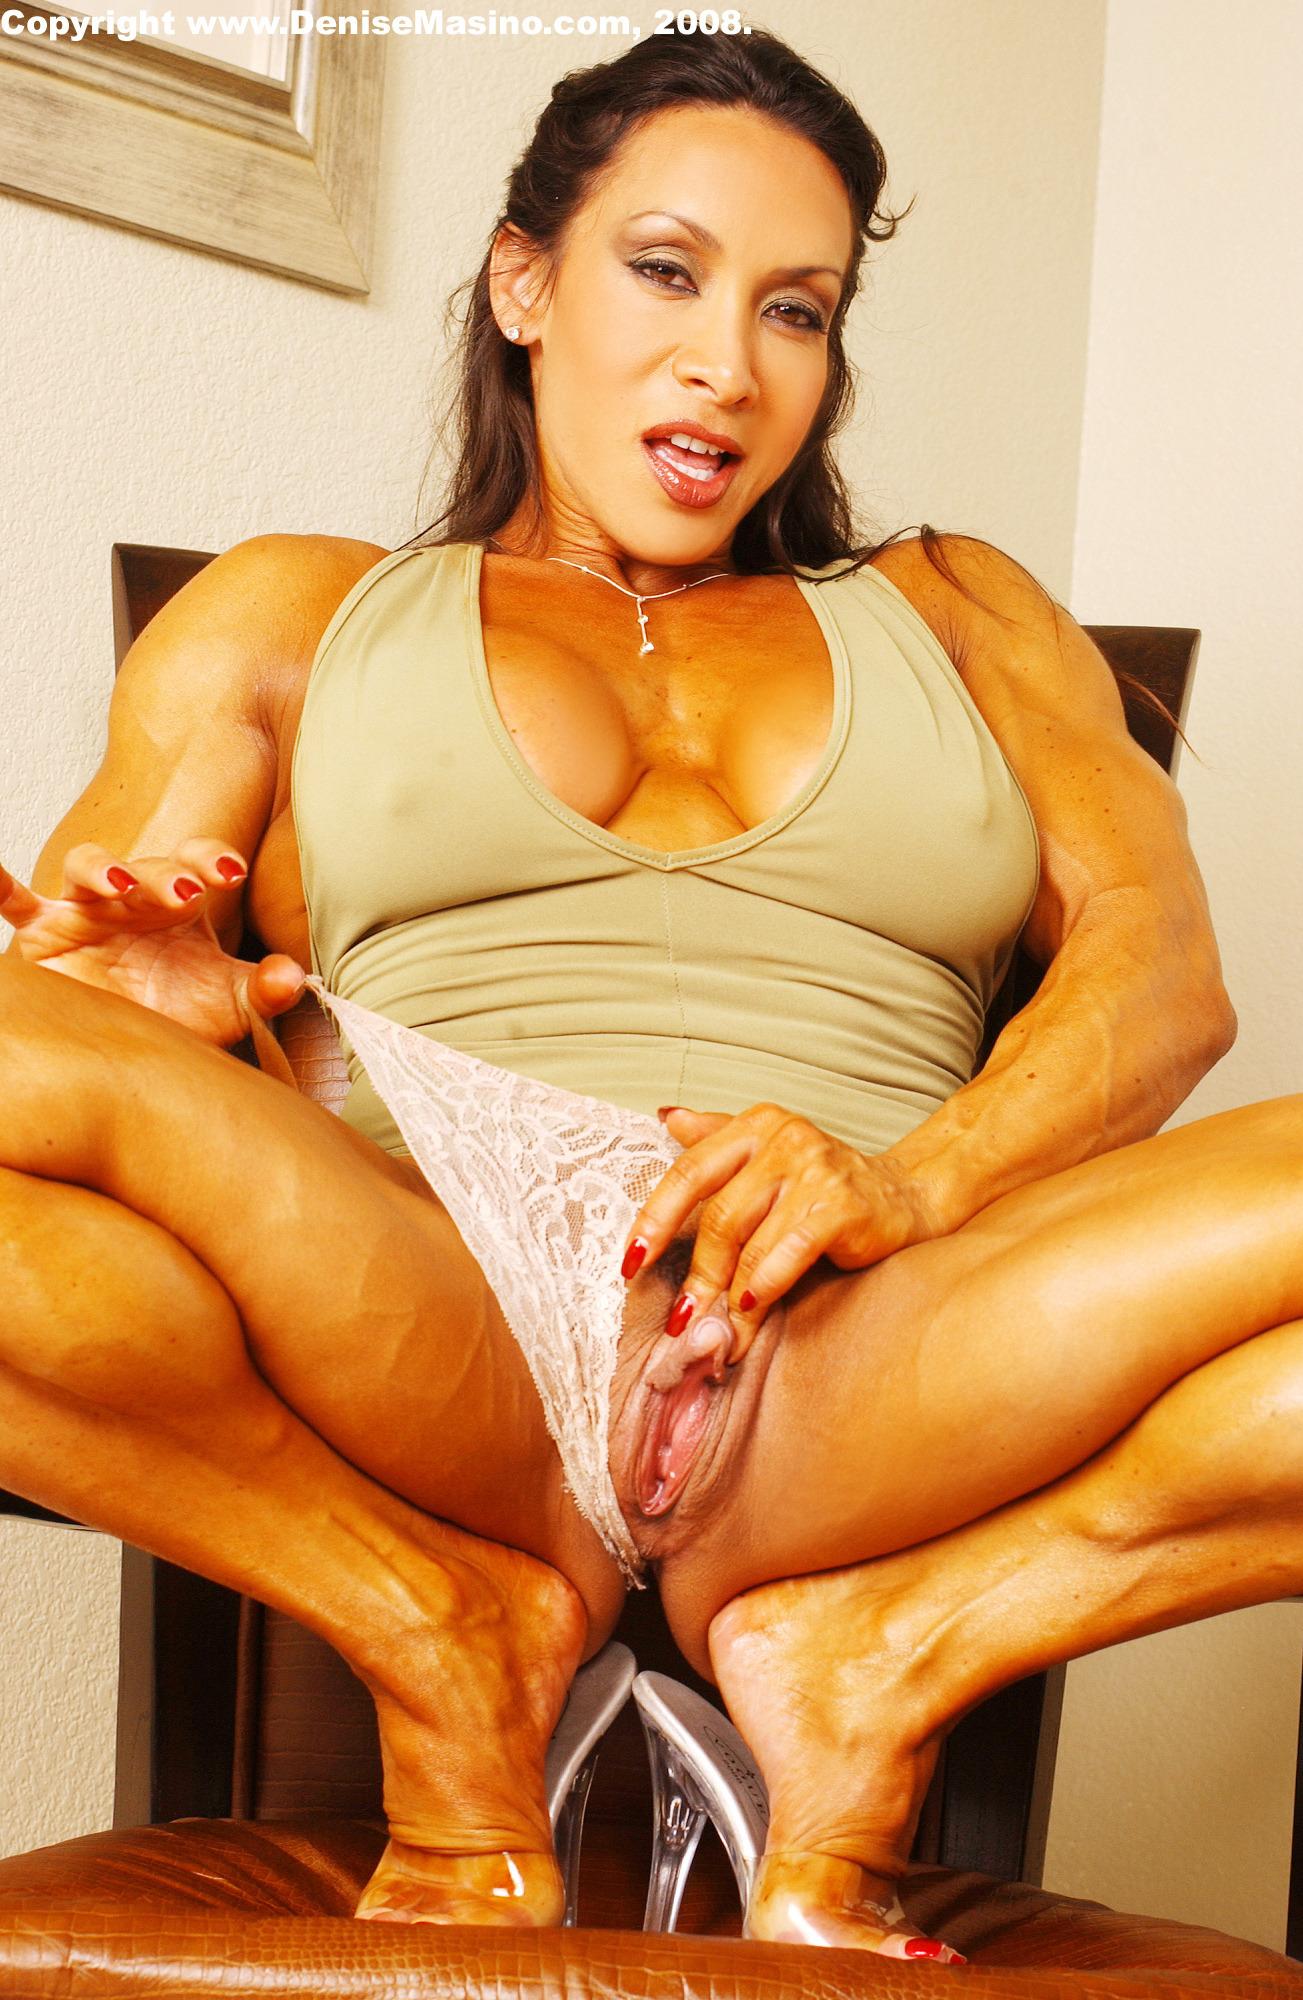 Denise masino porn